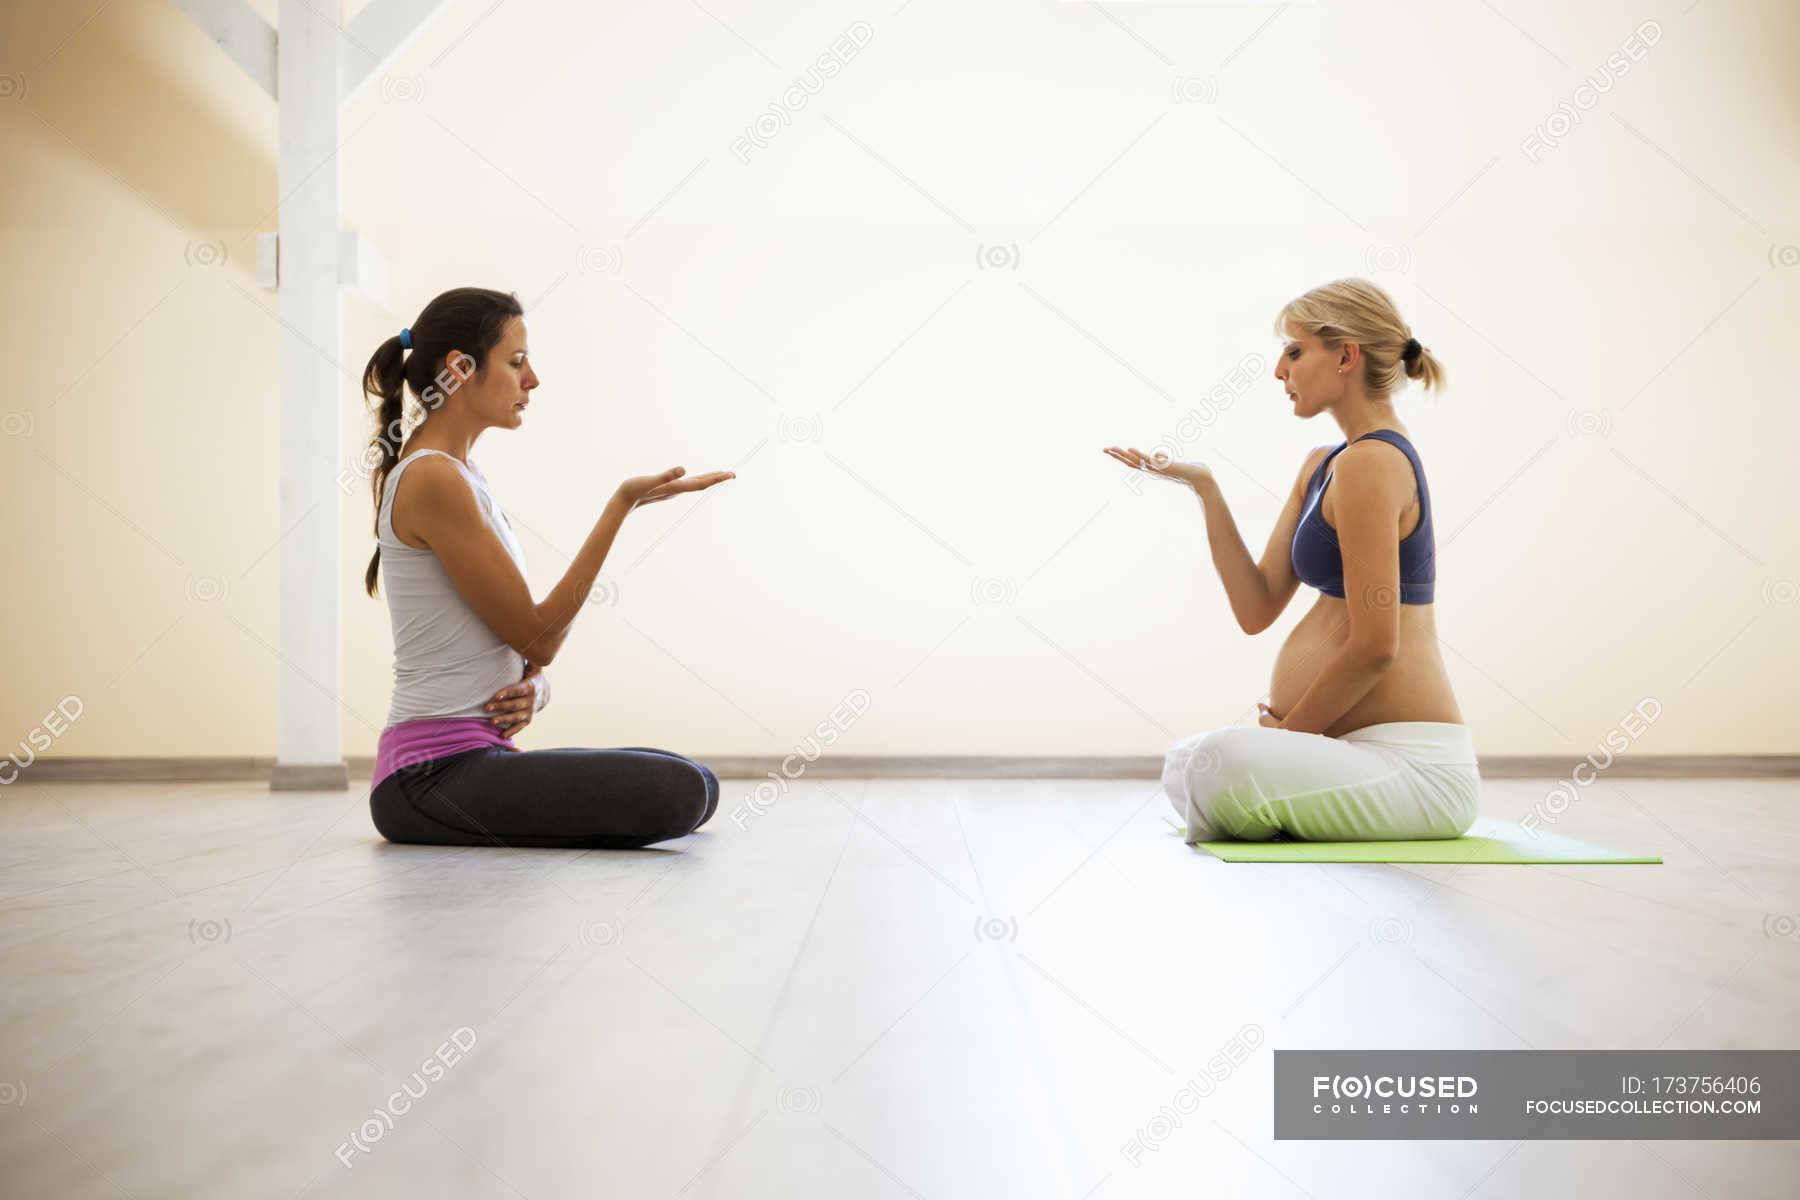 Prenatal Yoga Female Yoga Instructor Breathing Stock Photo